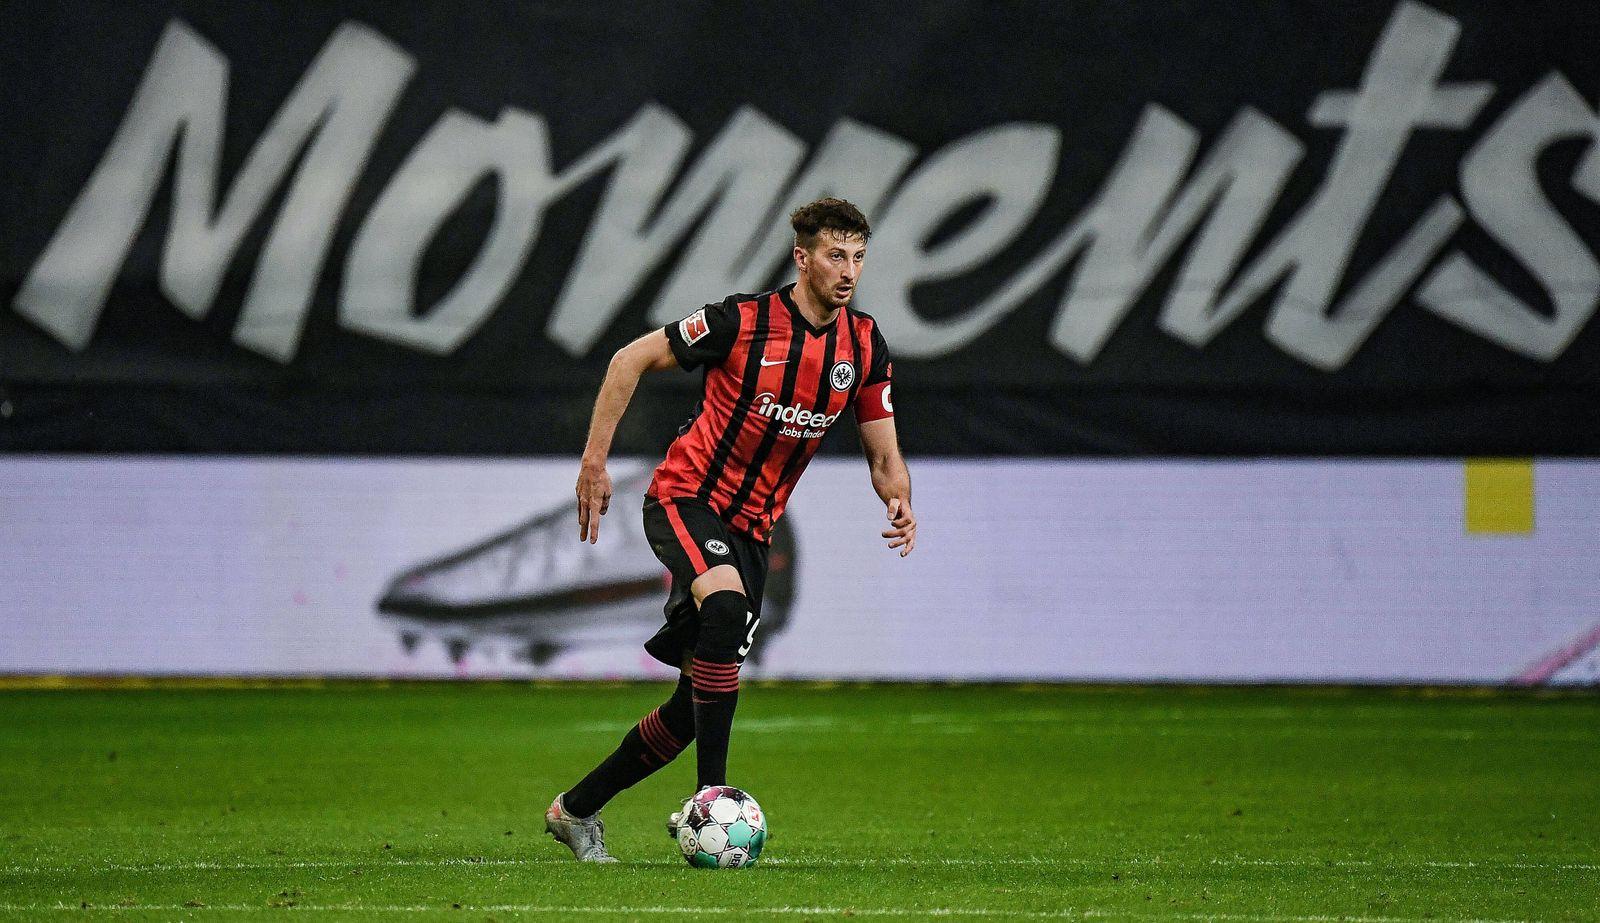 17.01.2021, xjhx, Fussball 1.Bundesliga, Eintracht Frankfurt - FC Schalke 04 emspor, v.l. David Abraham (Eintracht Fran